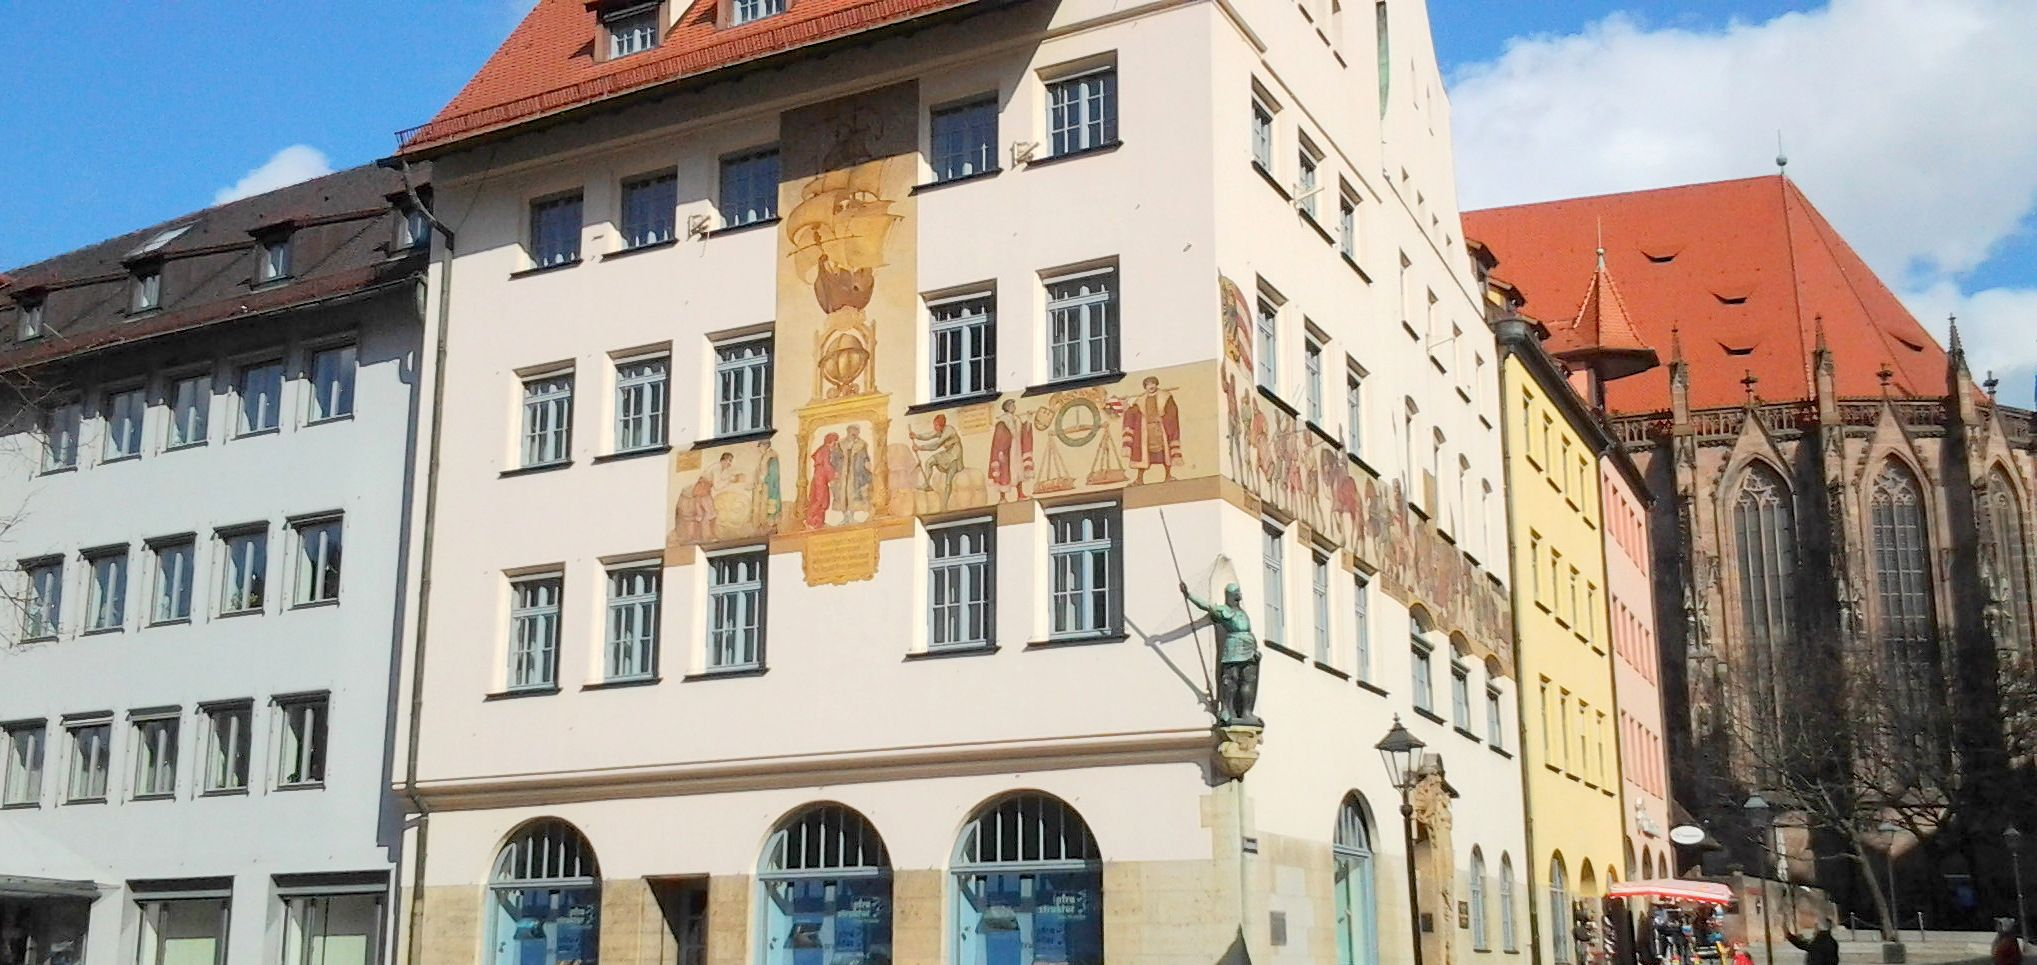 Palacios Nürnberg